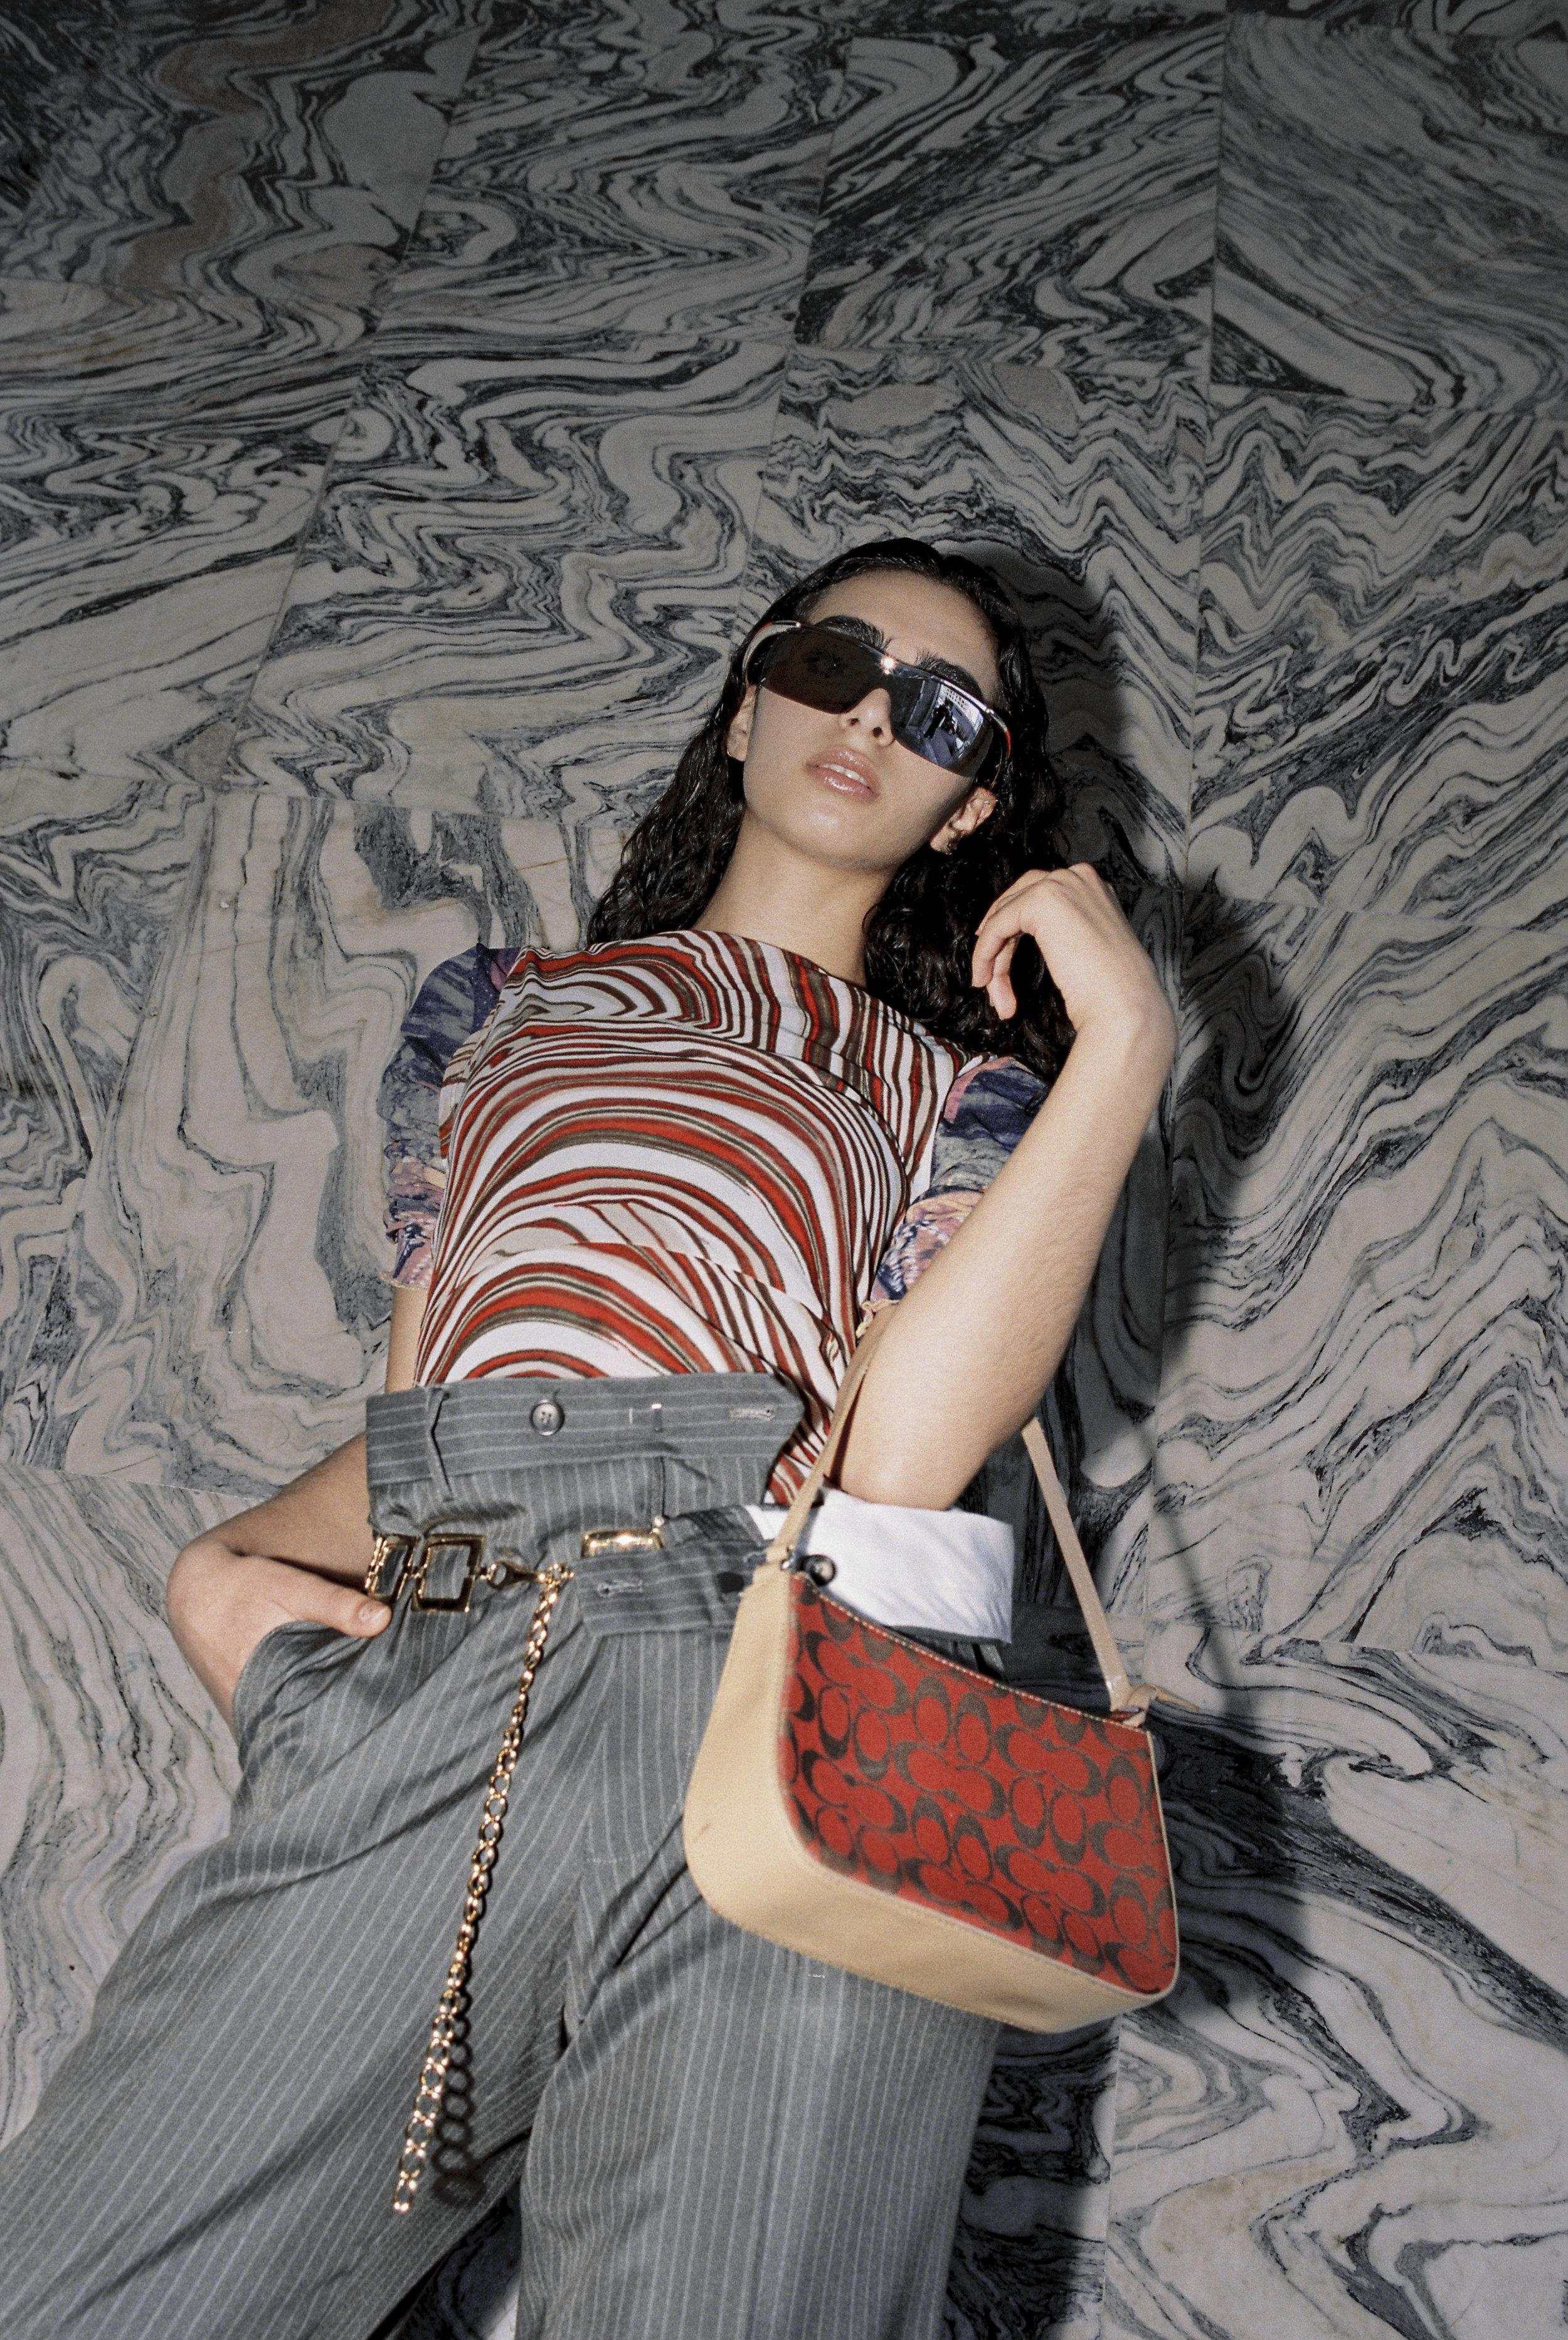 sunglasses Prada, top Mexx, bag Coa